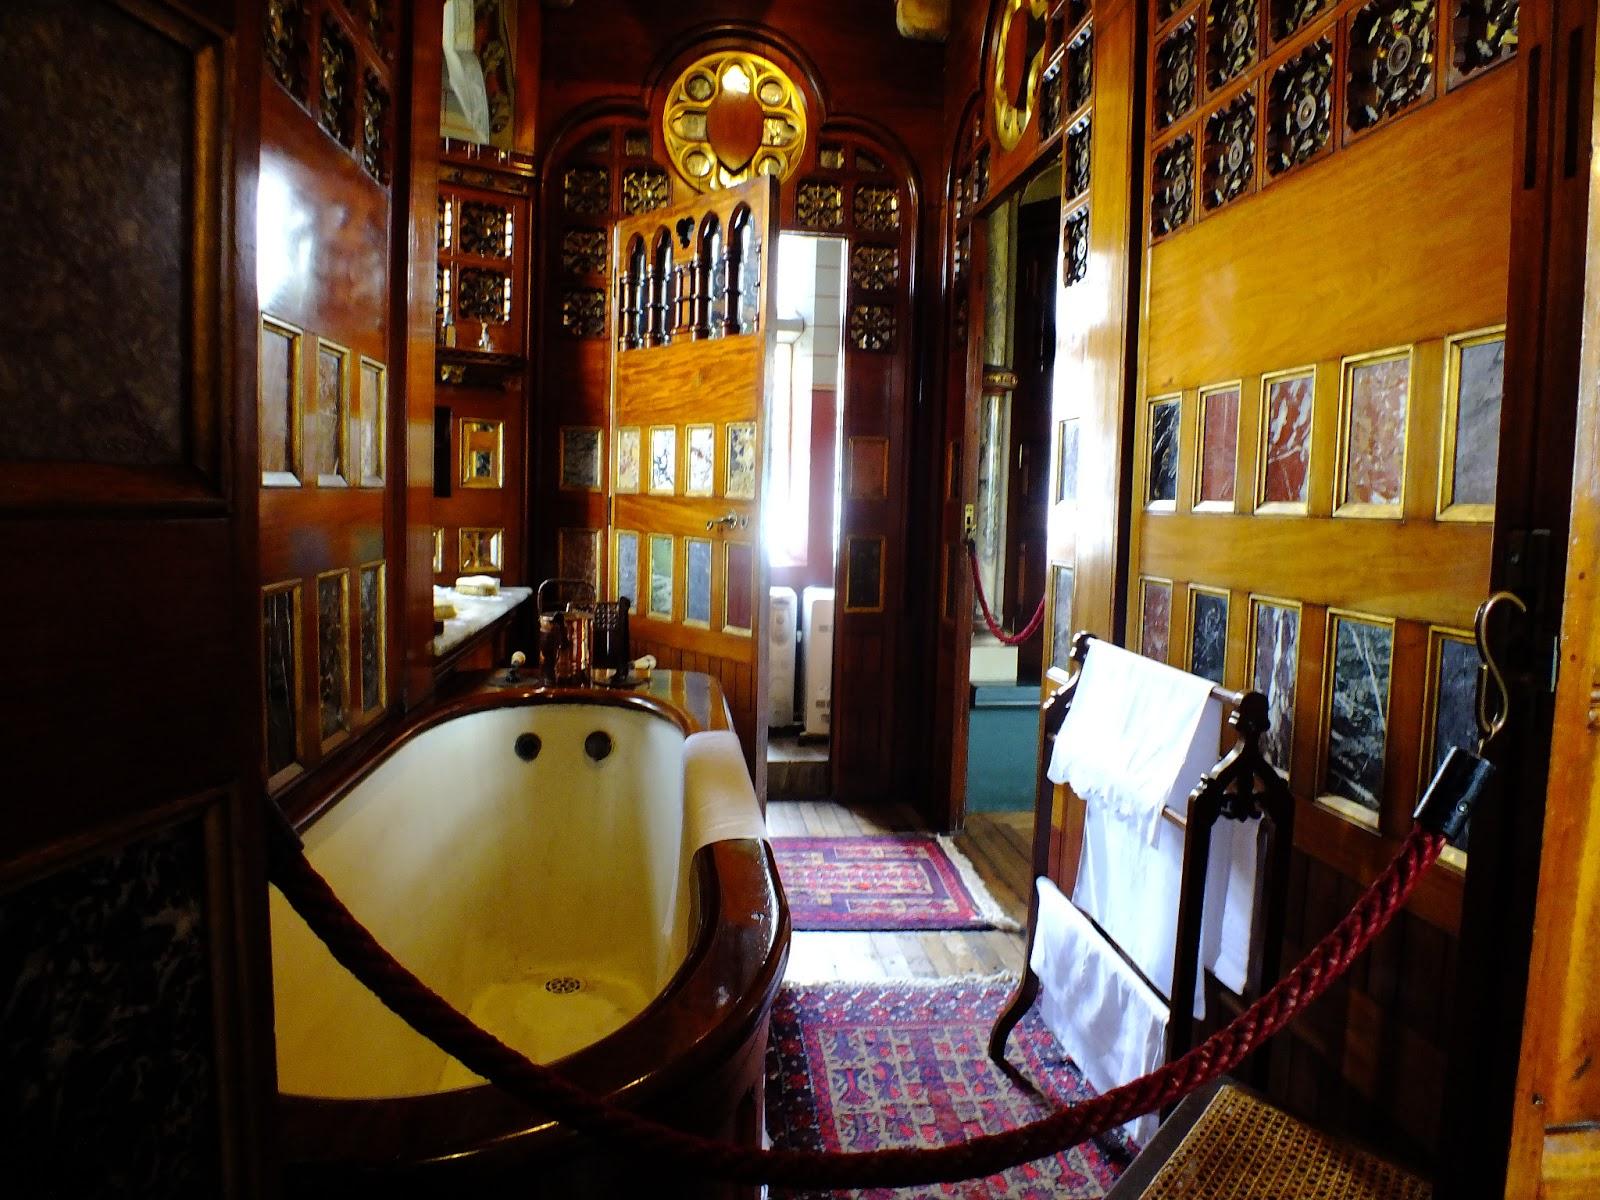 królewska łazienka